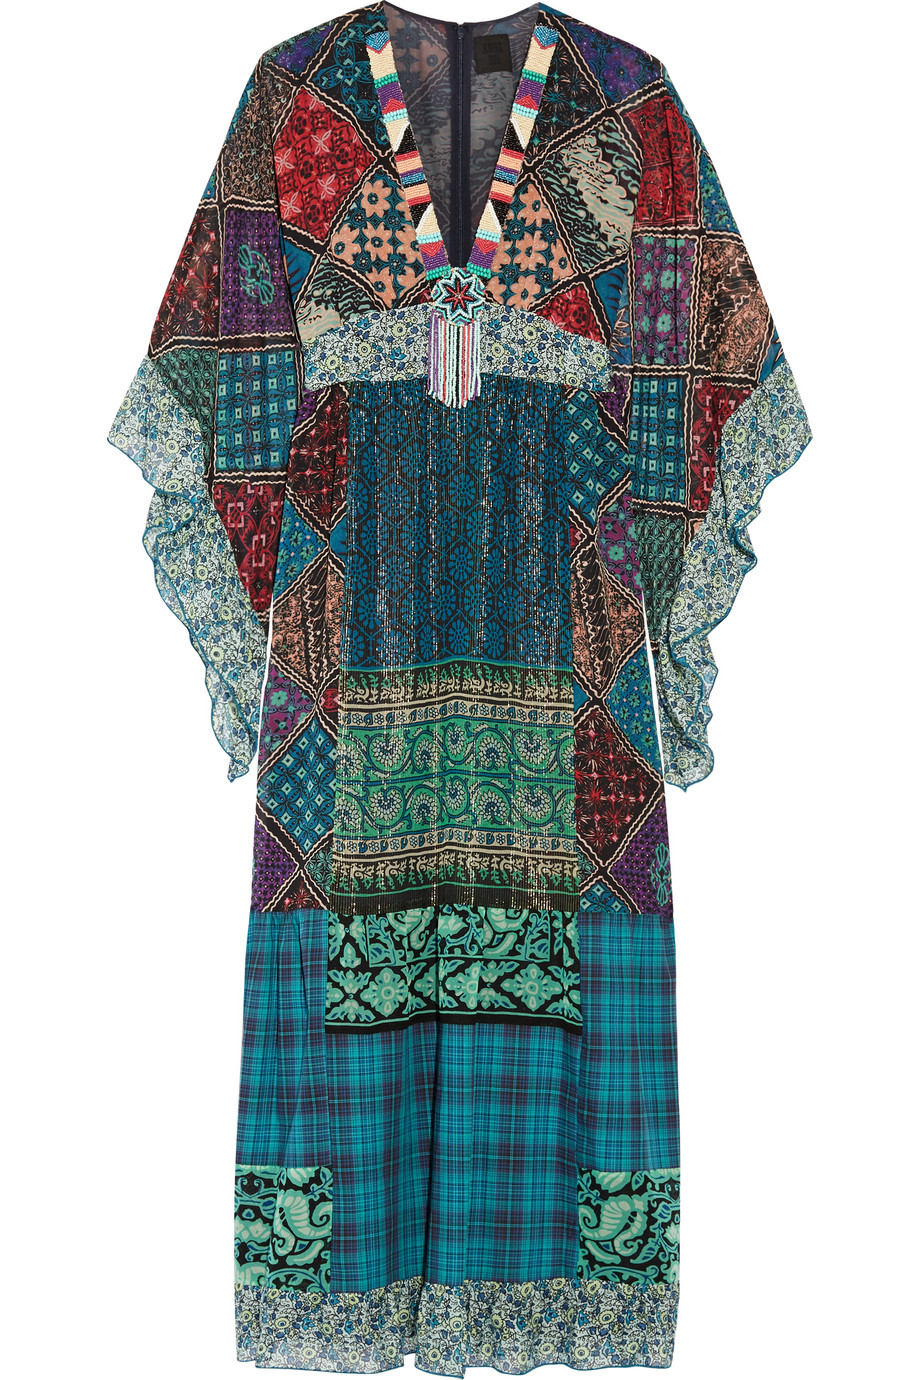 Anna Sui Embellished Silk-Blend Chiffon and Cotton Maxi Dress, Blue, Women's - Metallic, Size: L